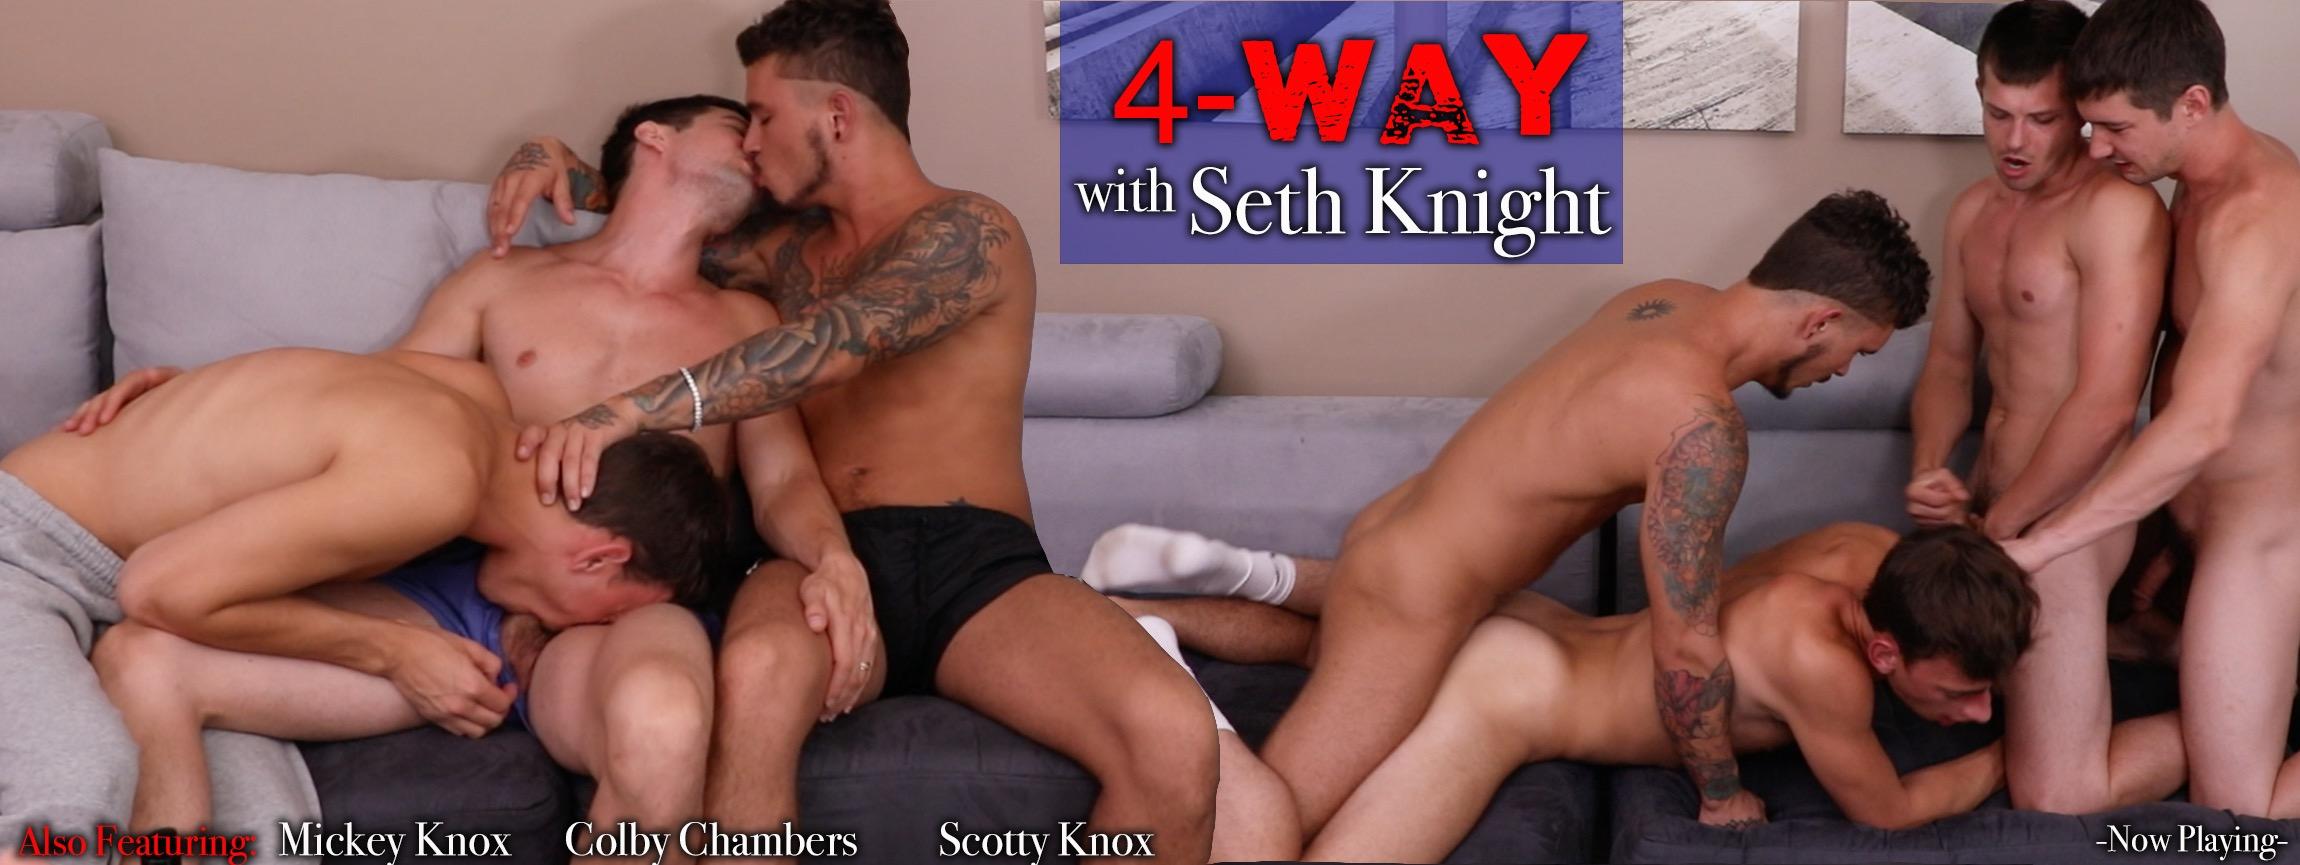 4-way with Seth Knight